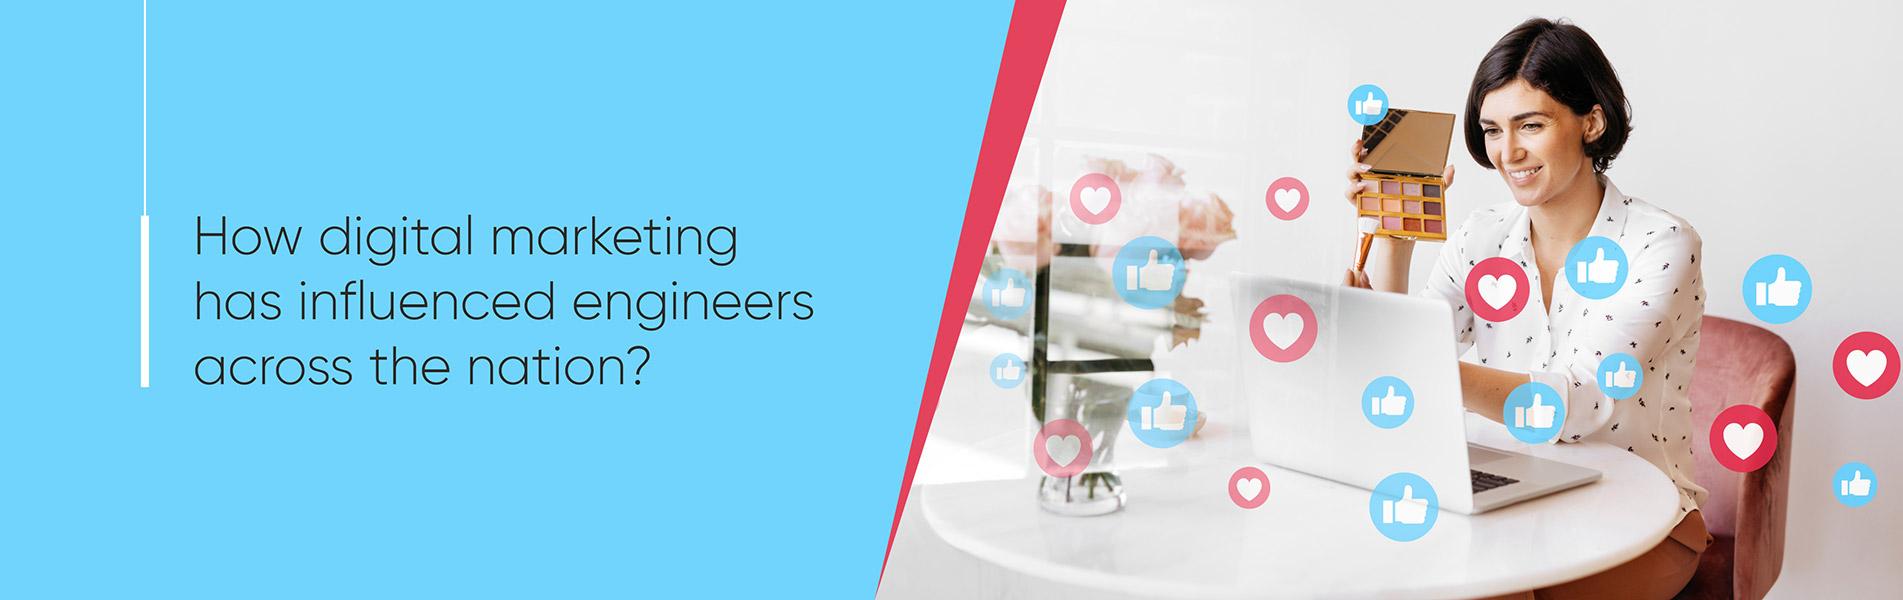 digital marketing, engineers